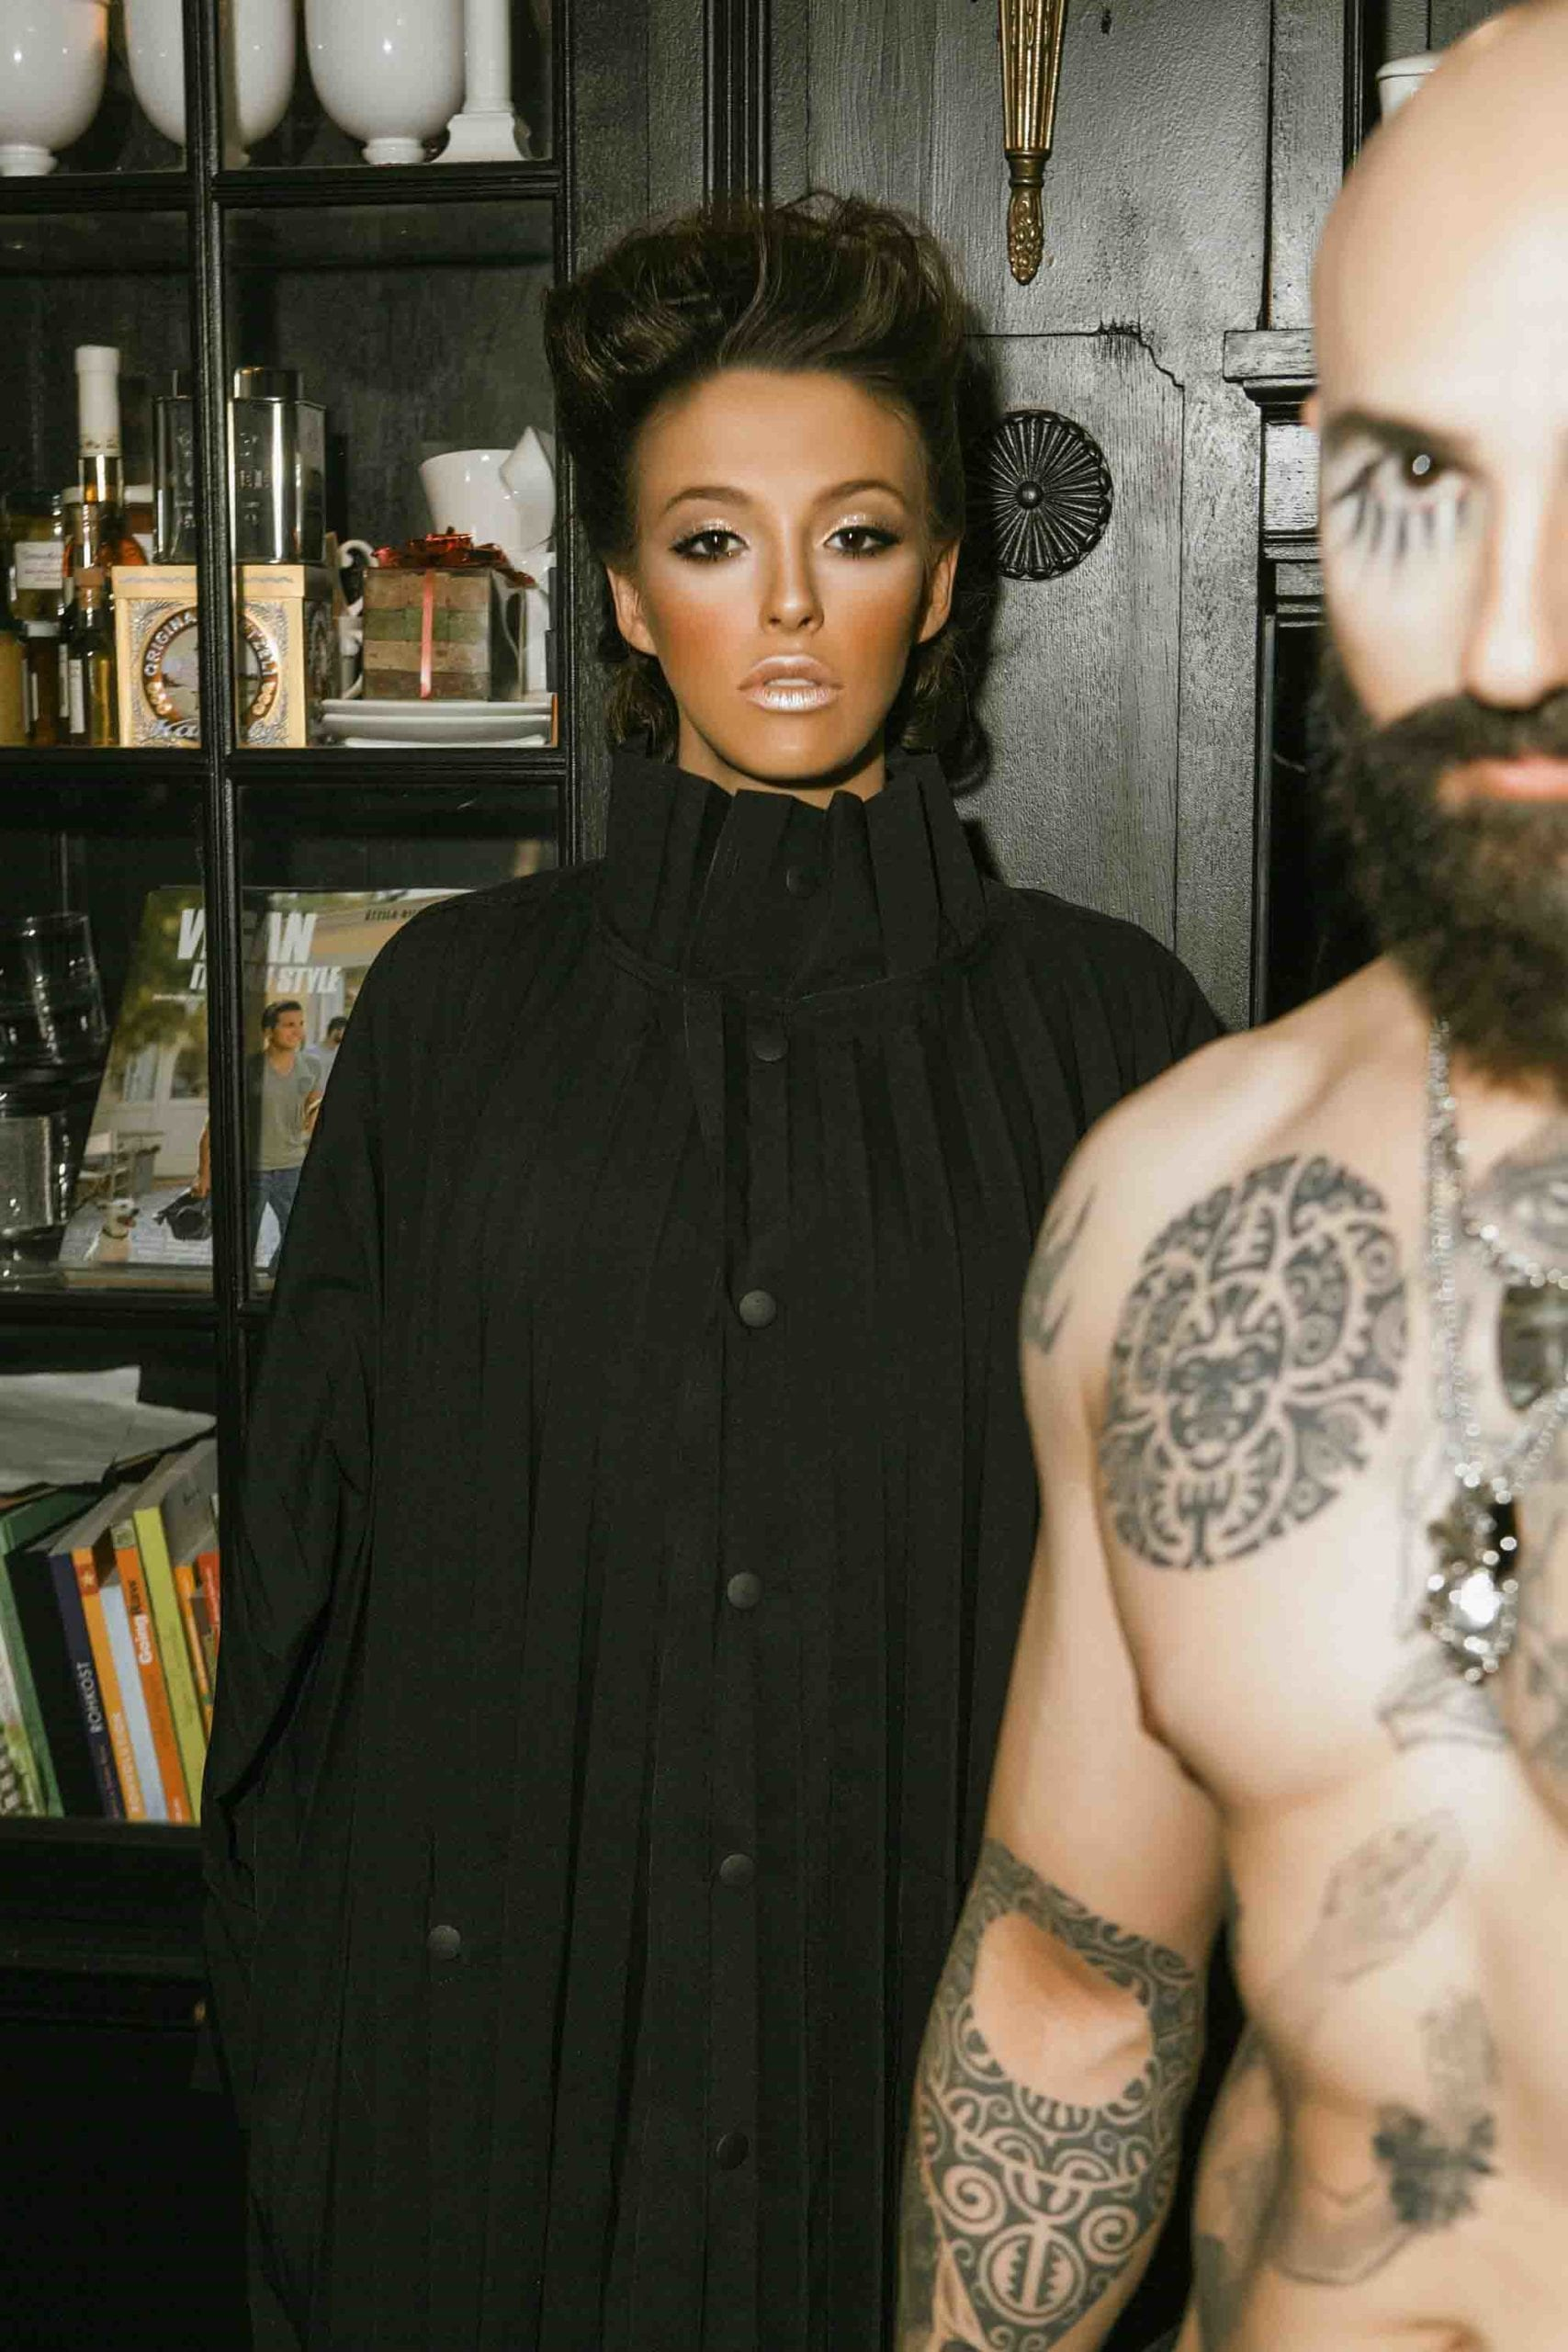 Beni Durrer, Yarin Shahaf, איפור, מגזין אופנה - 3